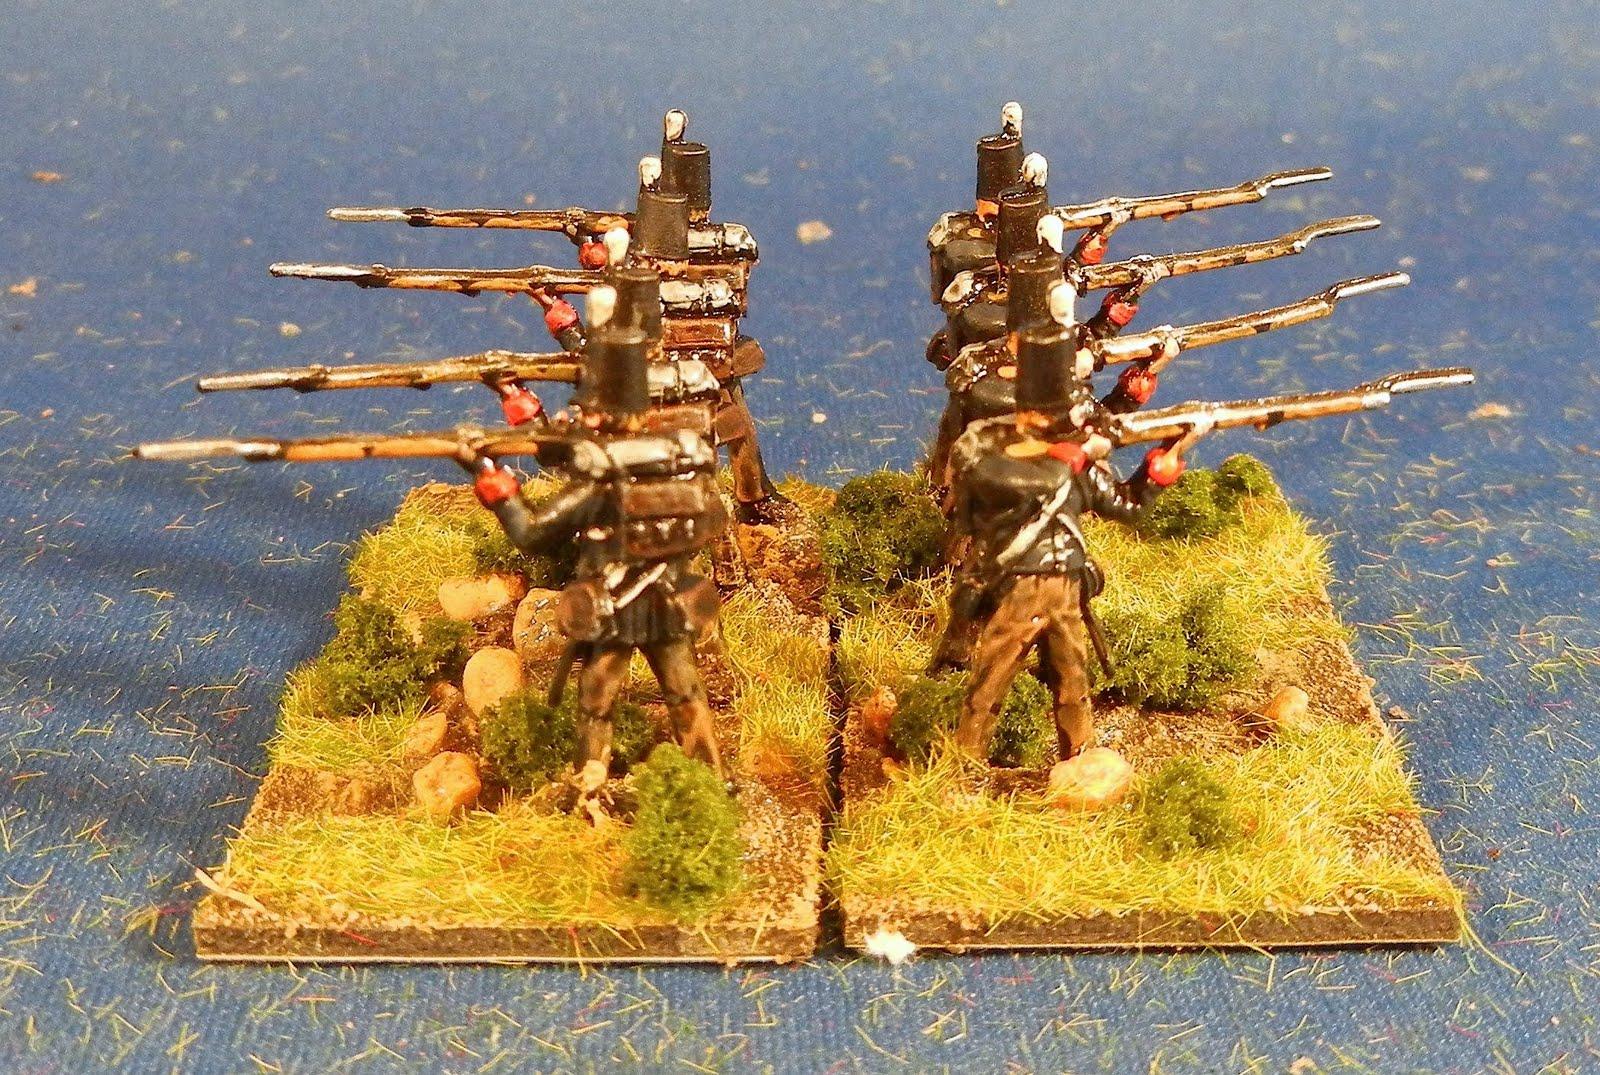 Bob S Miniature Wargaming Blog War Of Americans